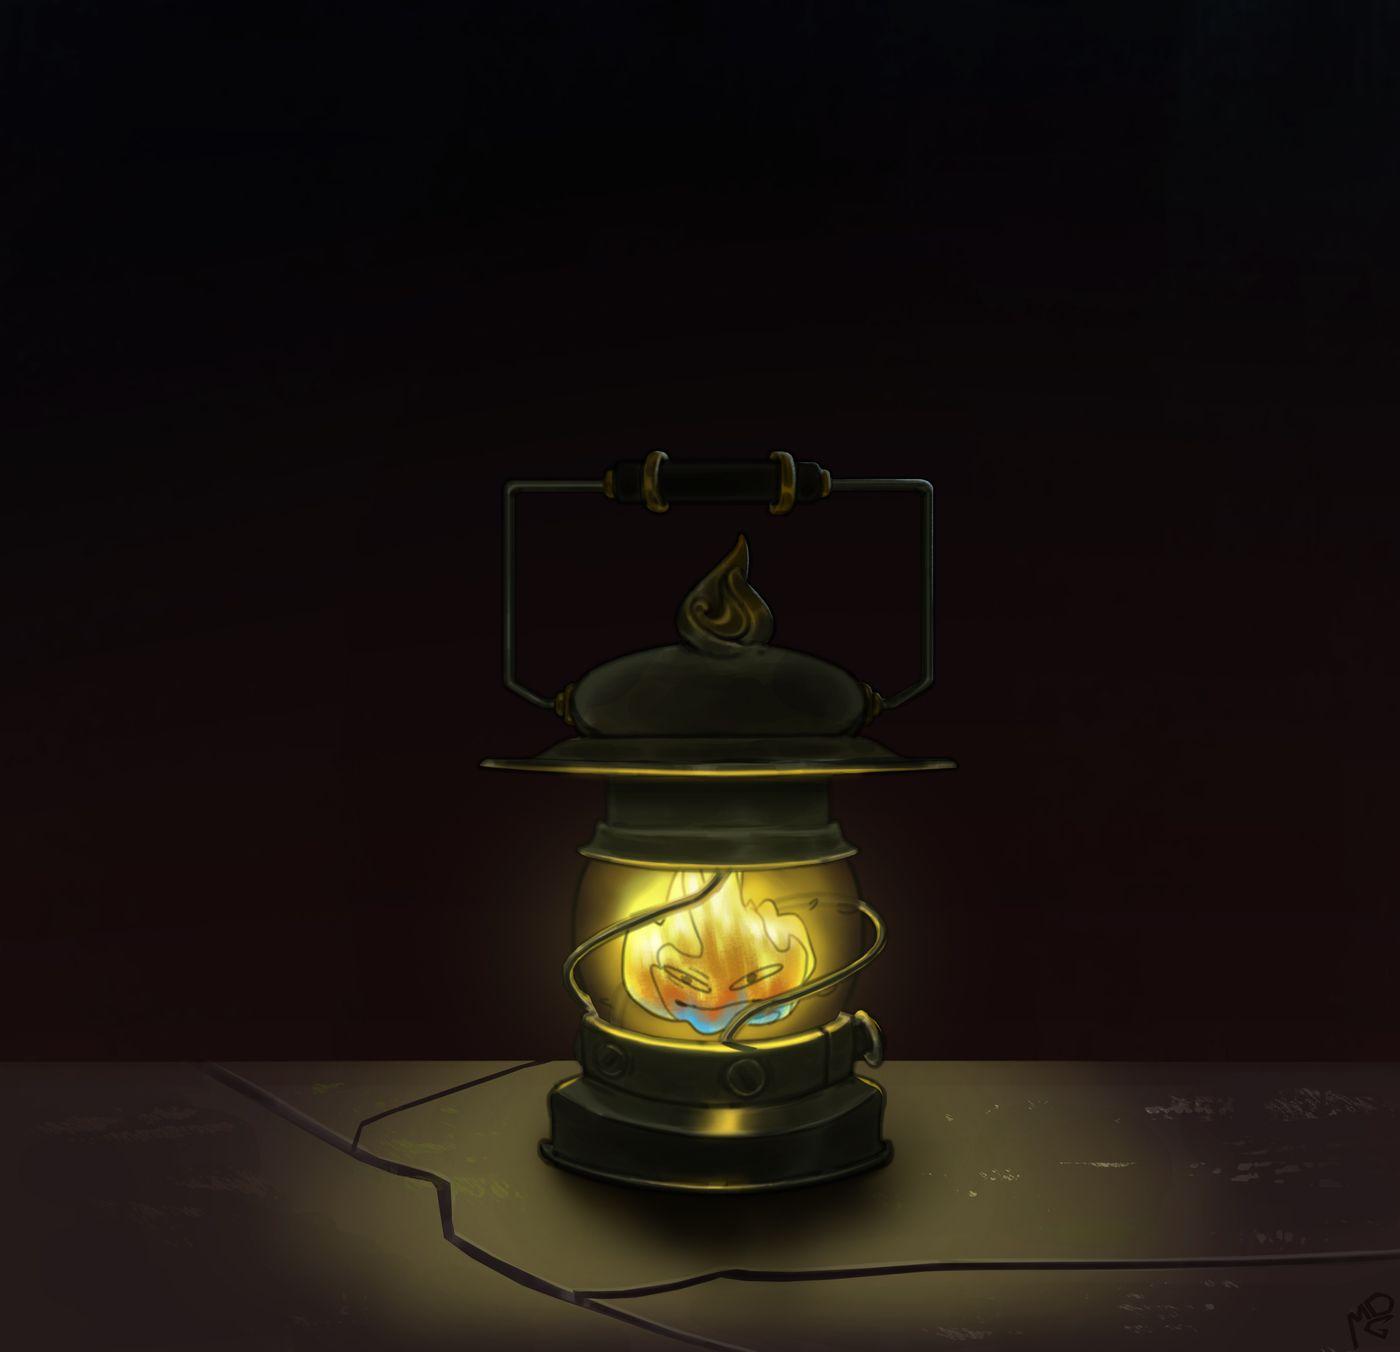 Lampe002 Nicomdg